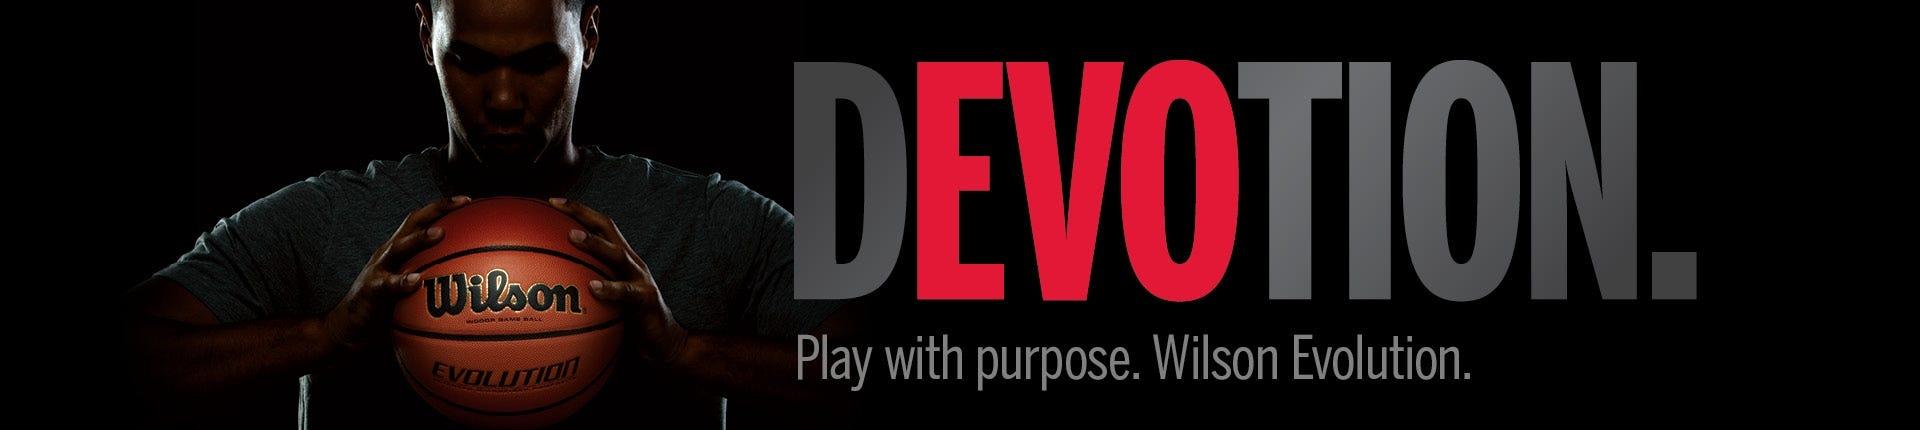 Play with purpose. Wilson Evolution Basketballs